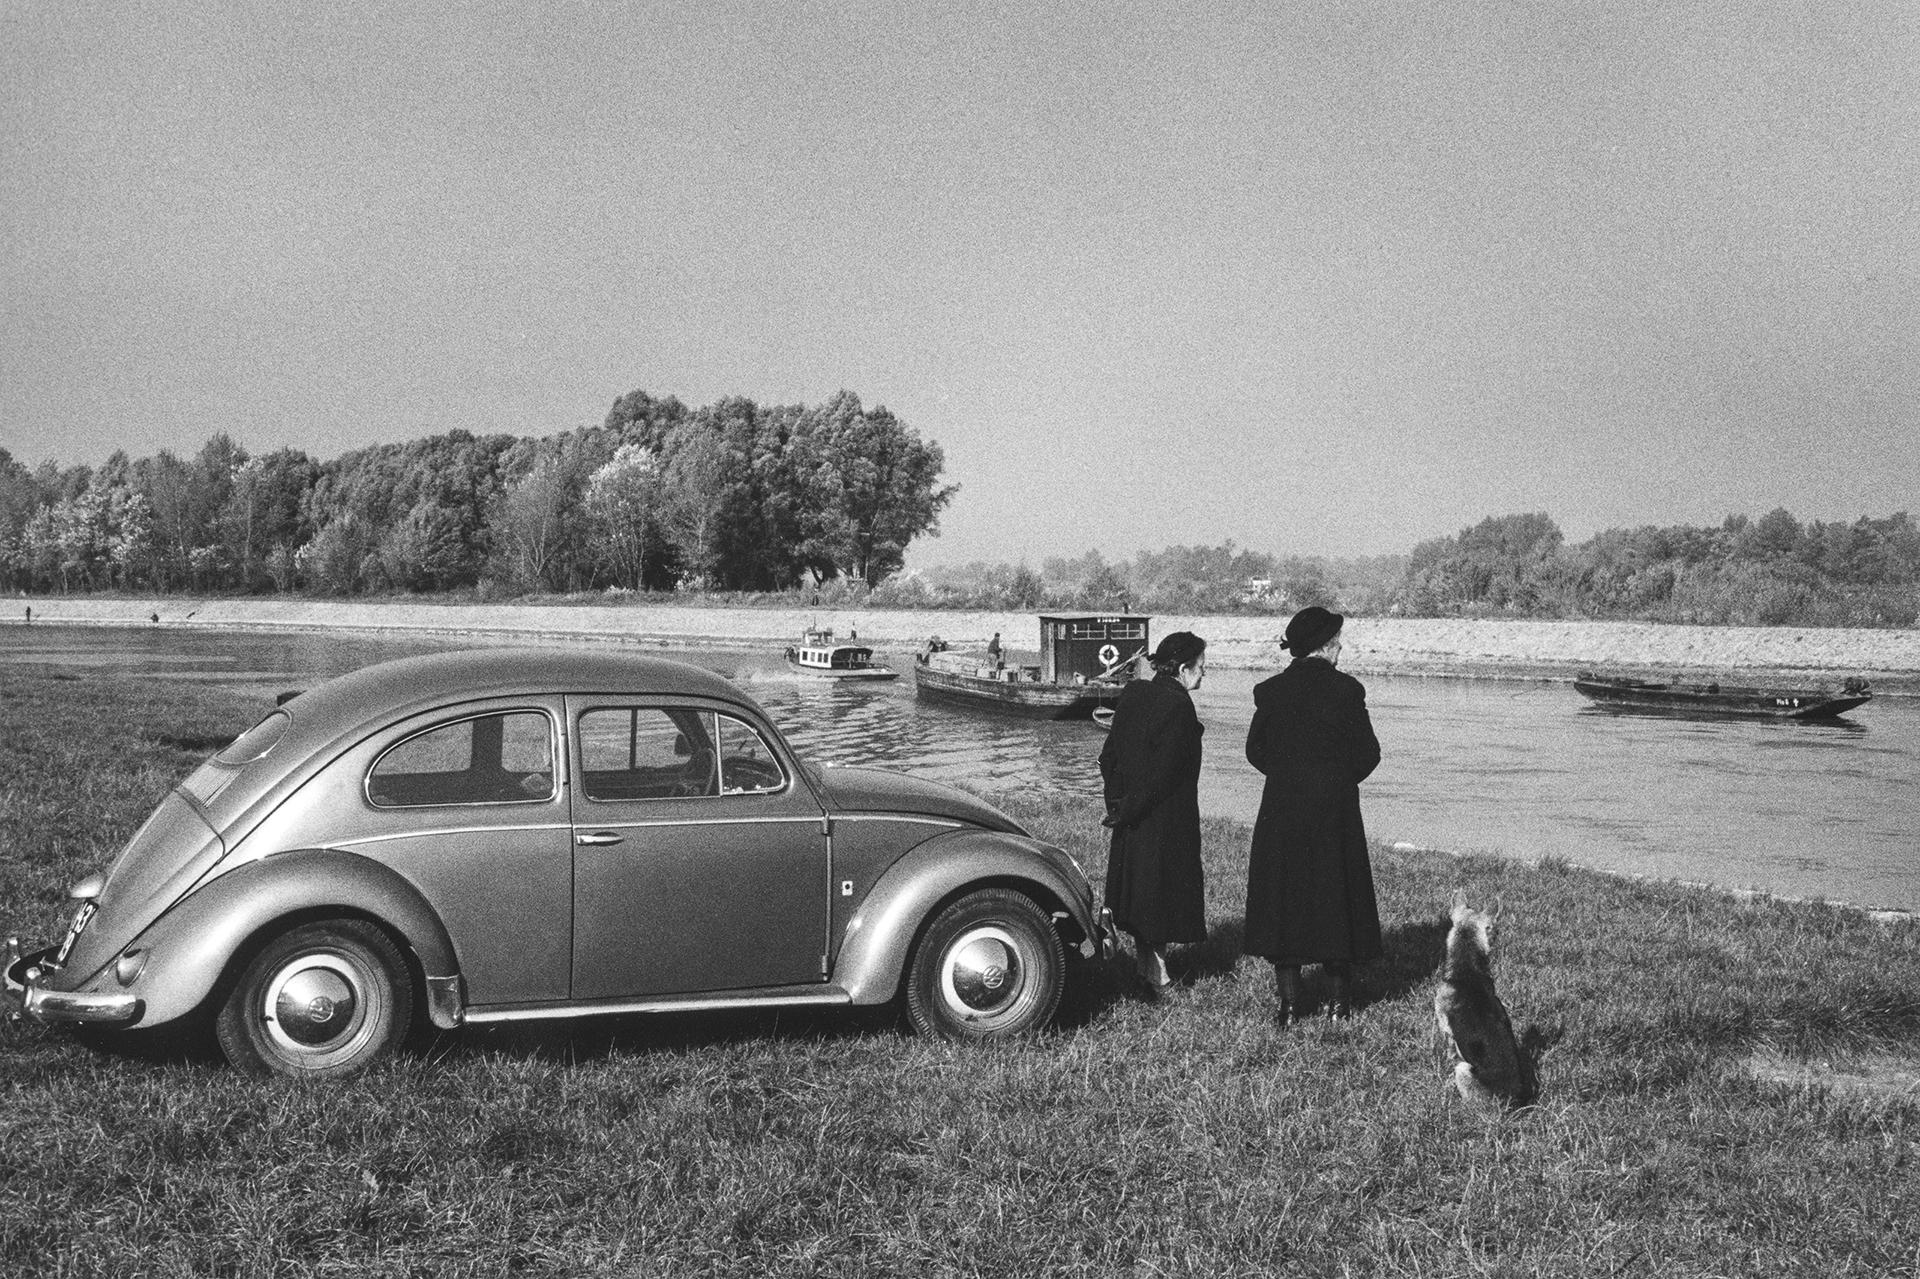 Inge Morath Paisaje cerca de Viena 1958© Inge Morath Foundation Magnum Photos